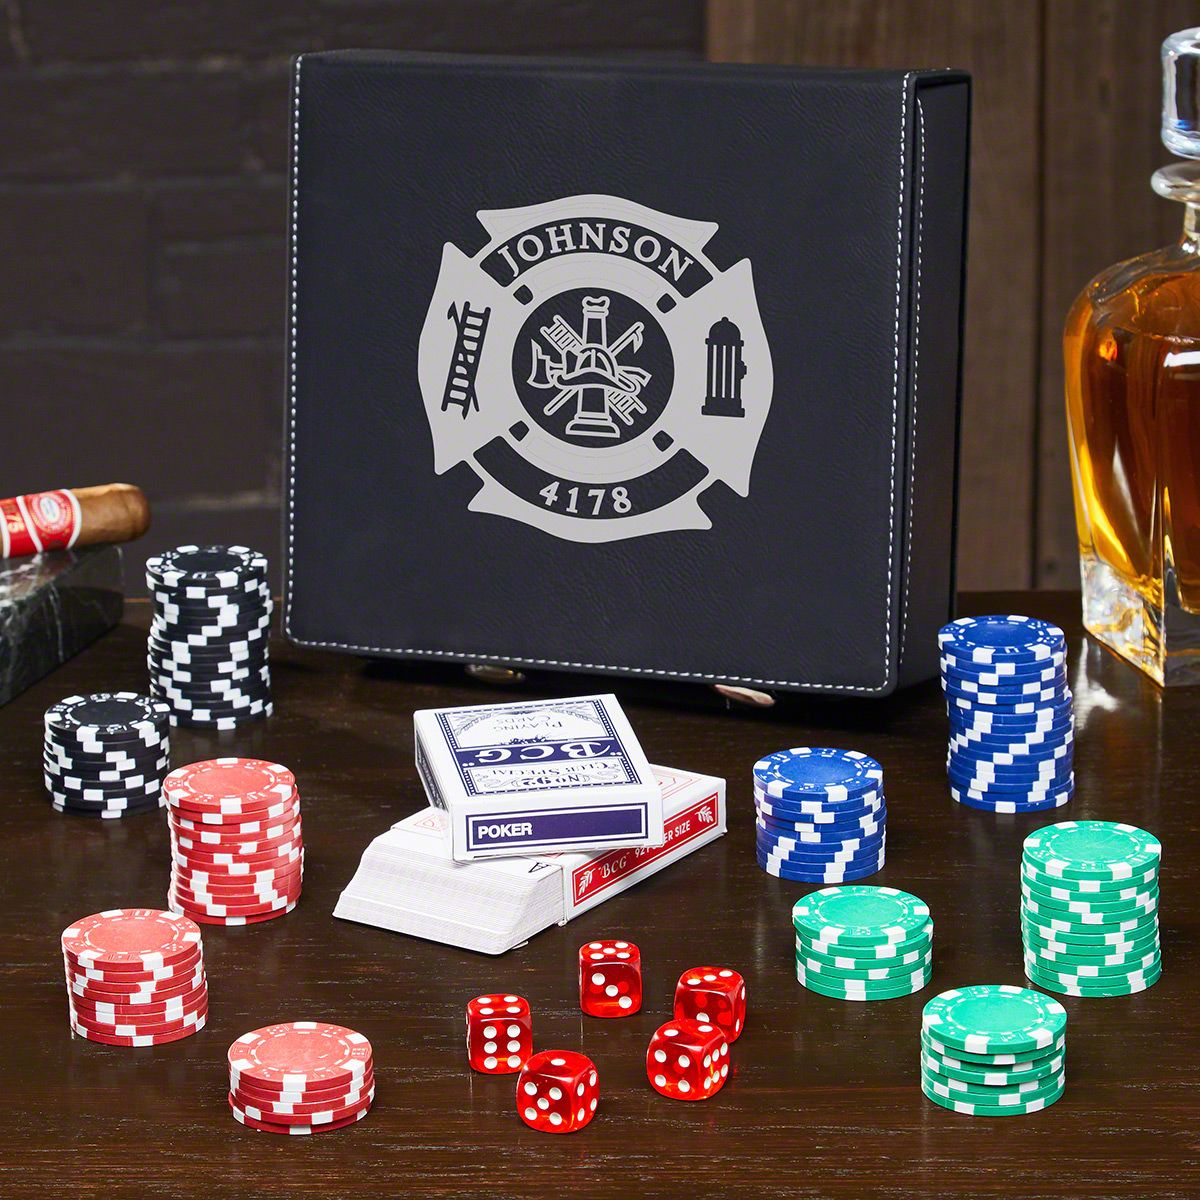 Fire & Rescue Custom Poker Set – Gift for Firefighters